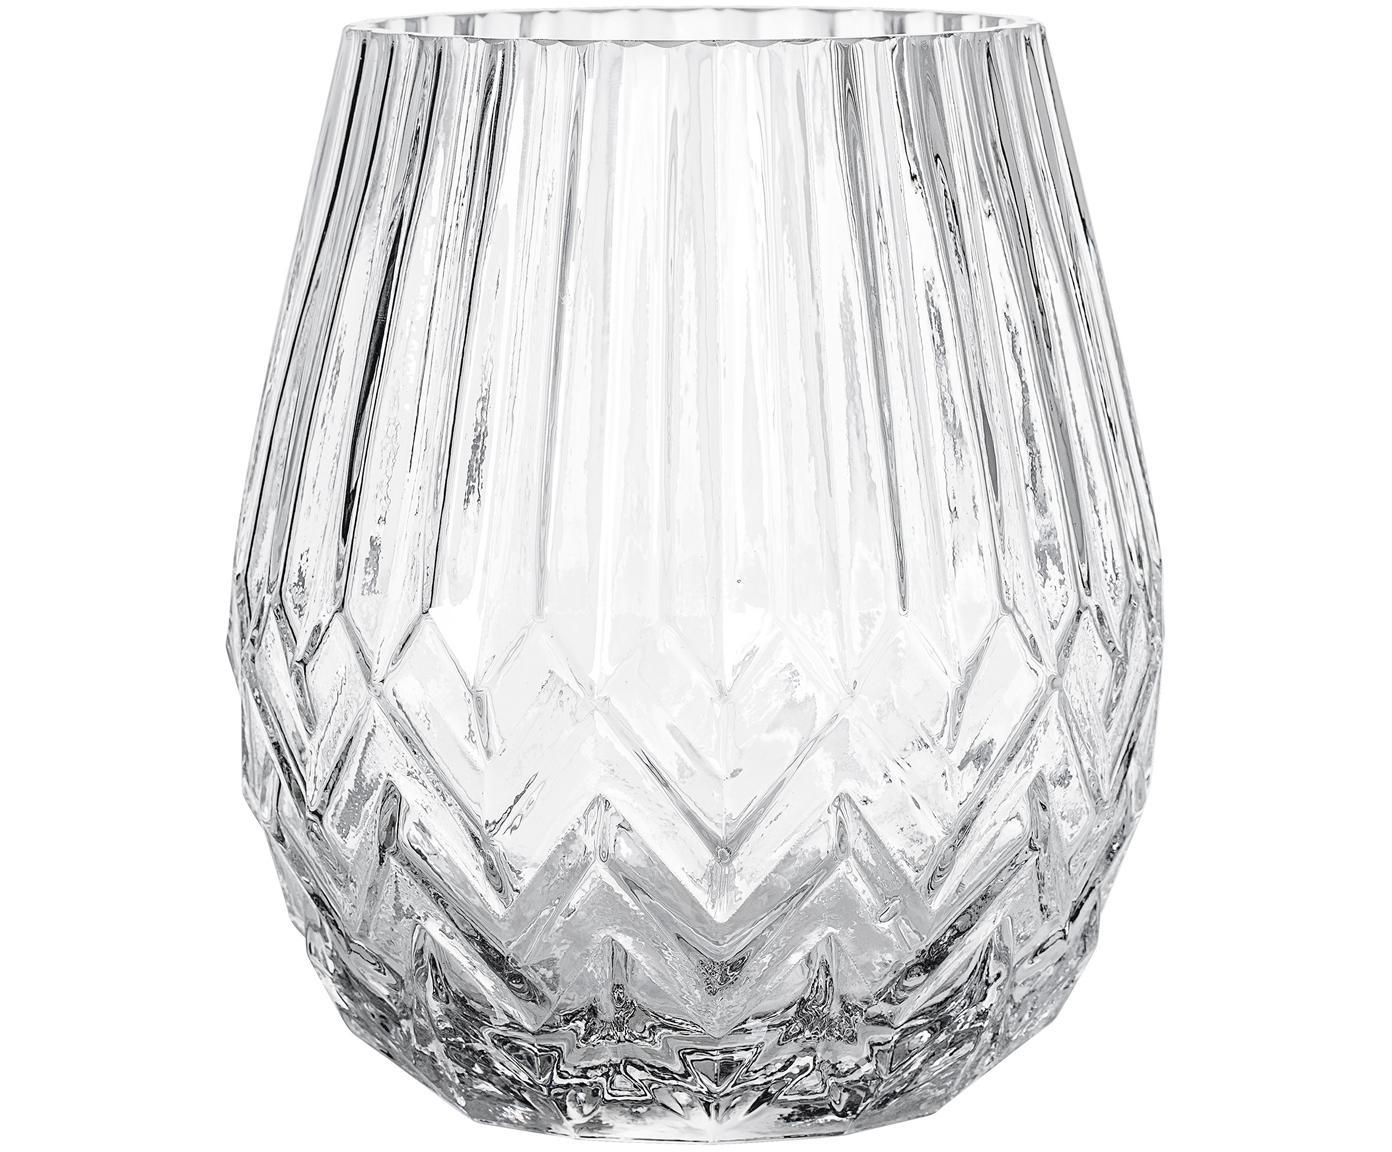 Jarrón de vidrio Luna, Vidrio, Transparente, Ø 14 x Al 17 cm